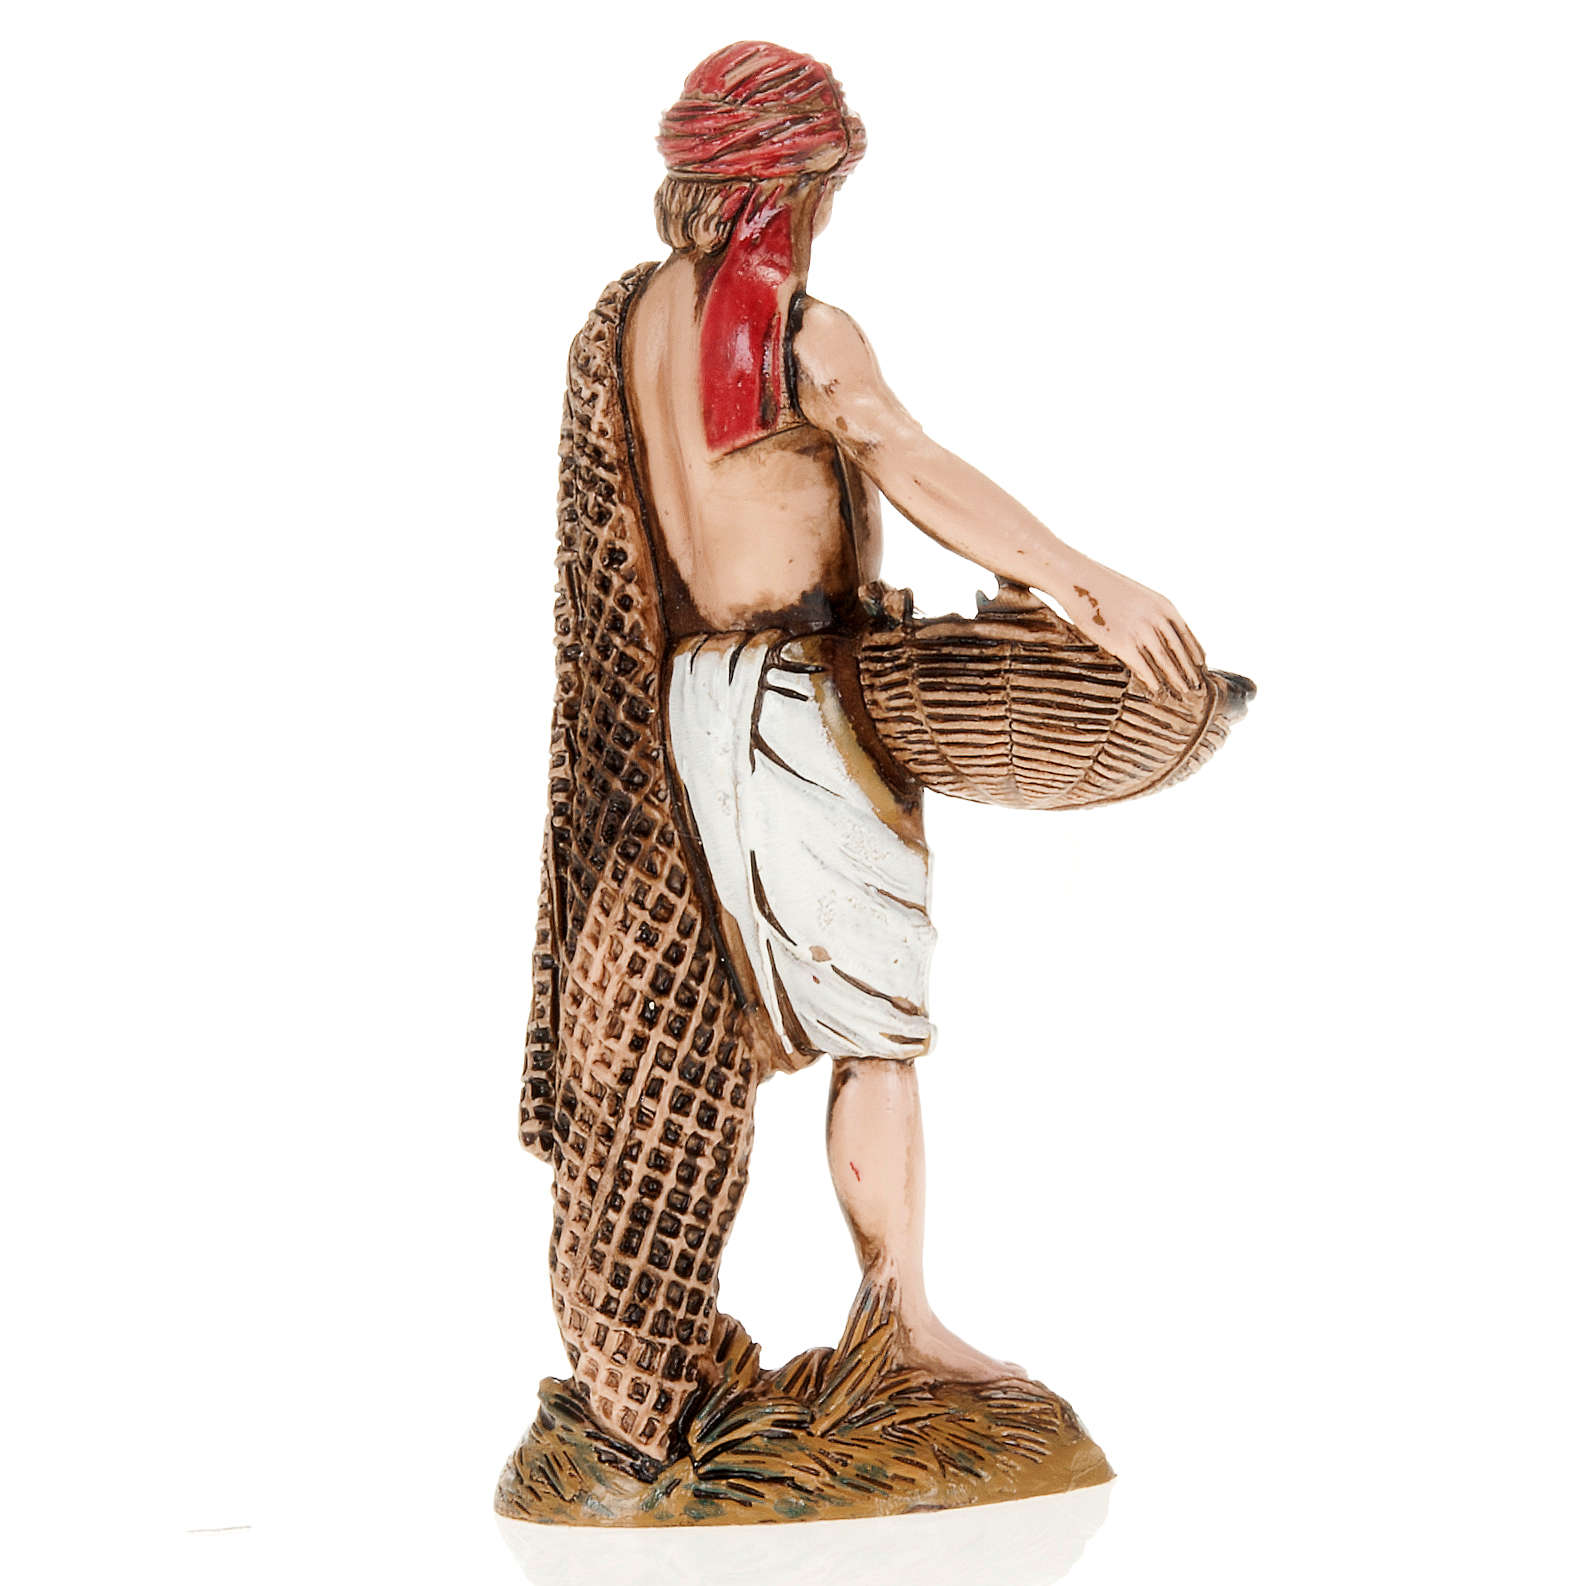 Figurines for Moranduzzo nativities, fisherman with basket and n 3